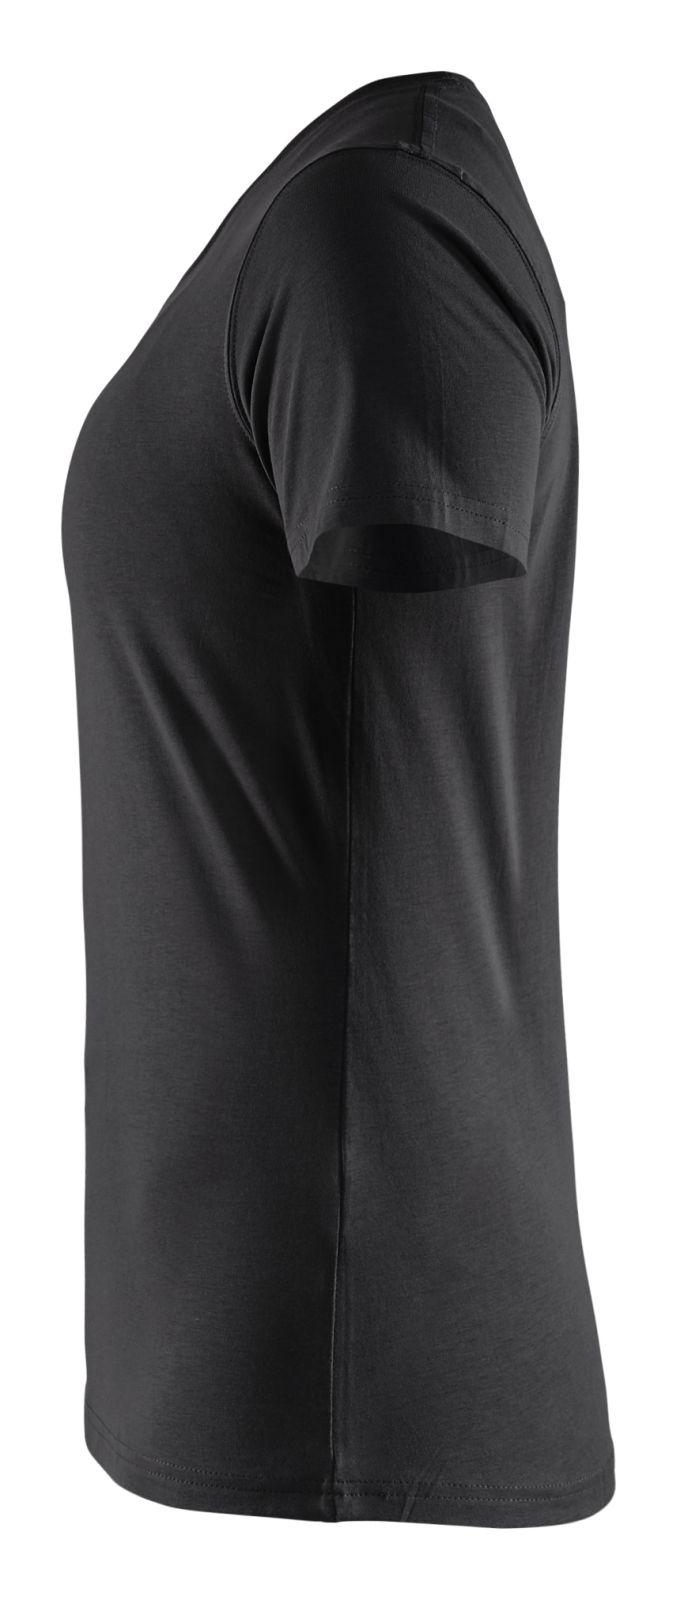 Blaklader Dames T-shirts 33341042 zwart(9900)